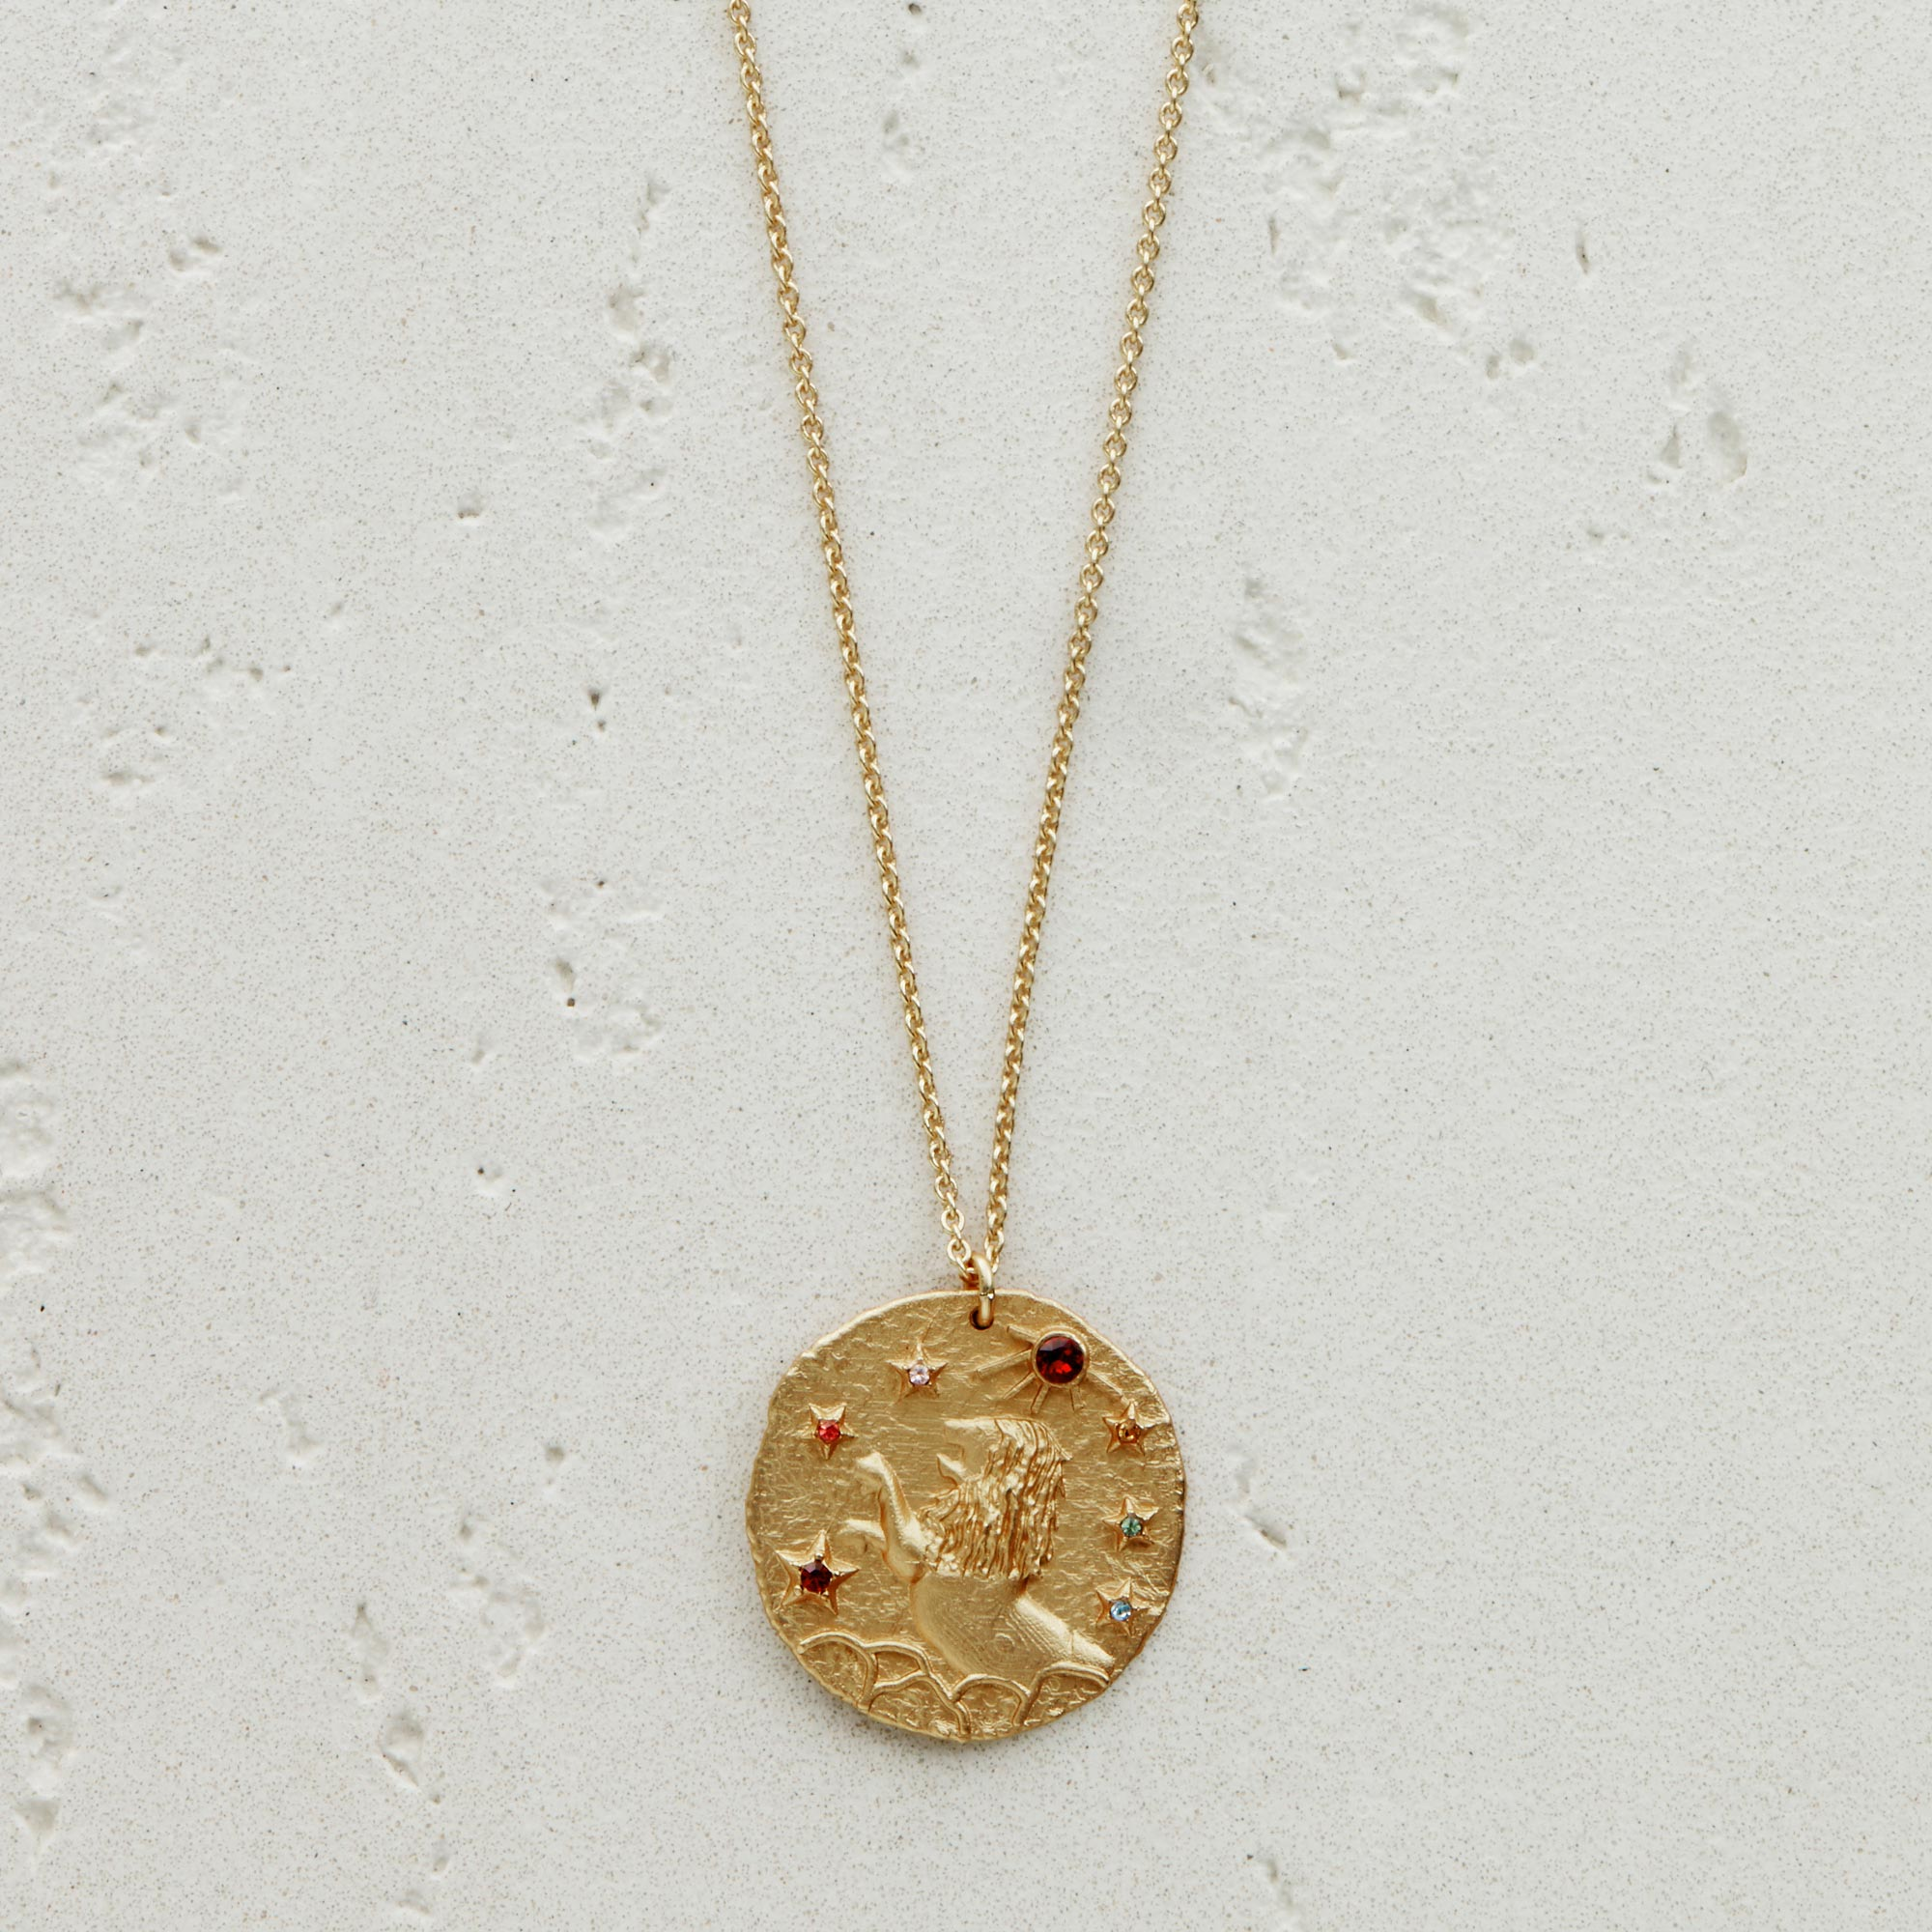 Leo Astro necklace - Gold